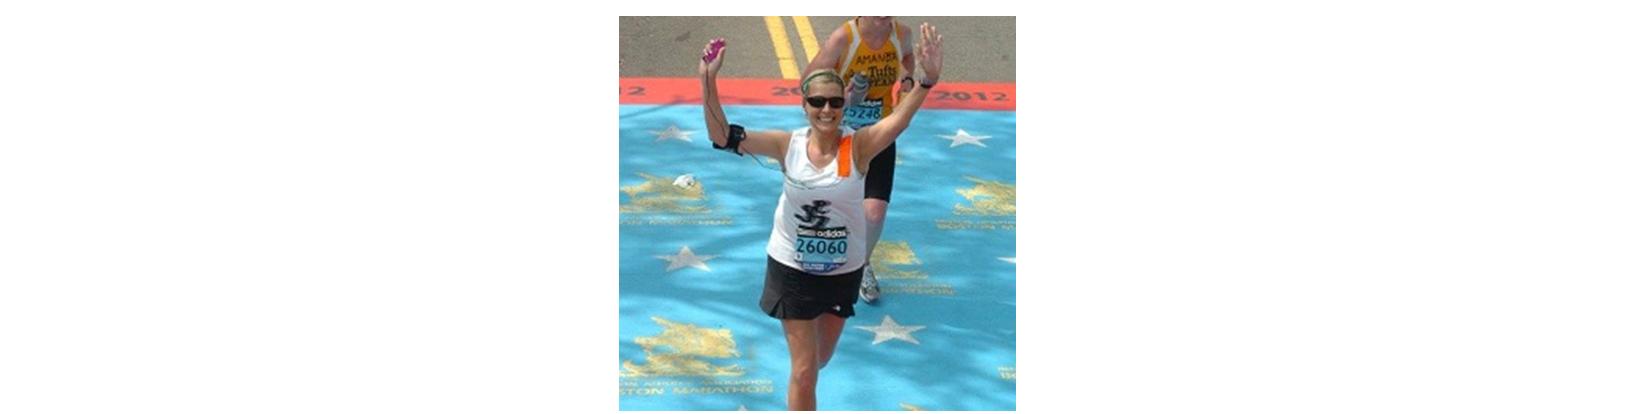 Rare Runner to Run Miami Marathon